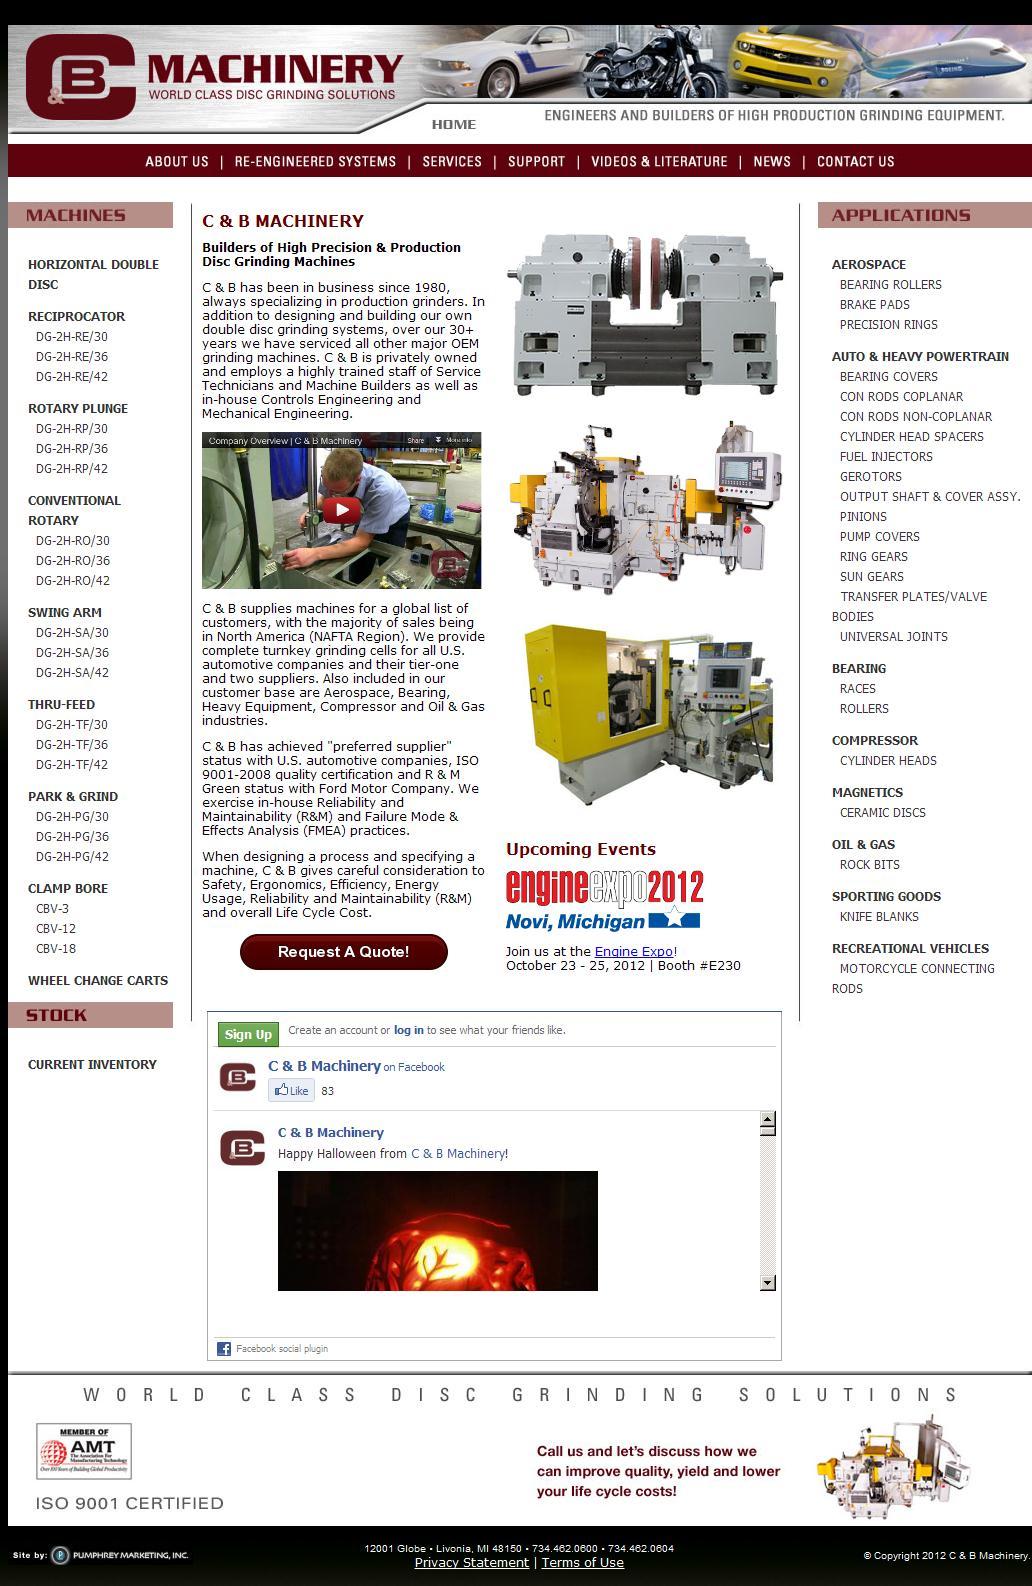 C & B Machinery | World Class Disc Grinding Solutions